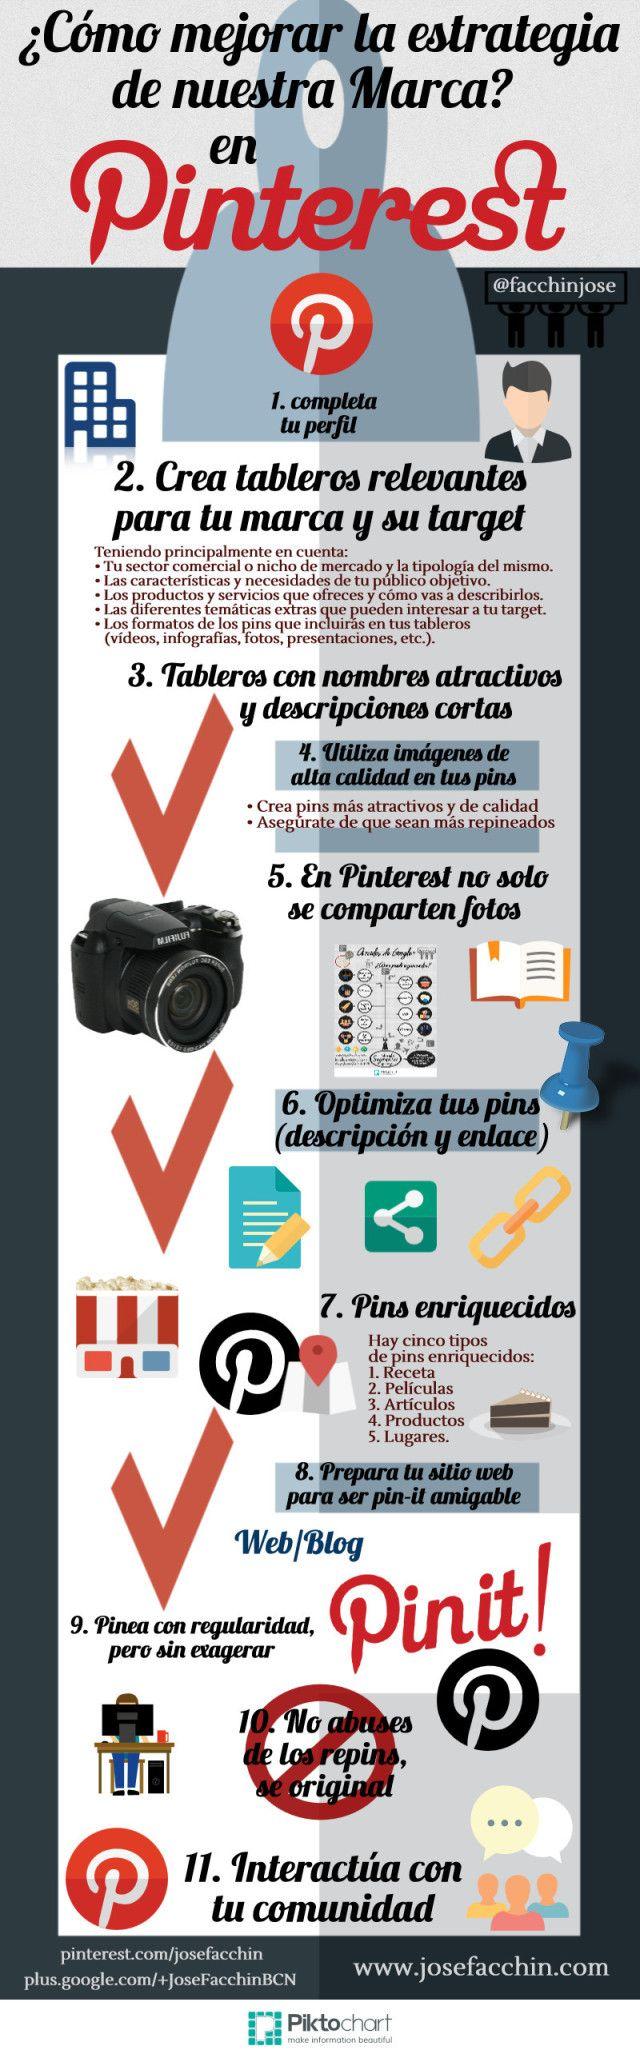 Cómo mejorar la estrategia de marca en Pinterest #infografia #infographic #socialmedia